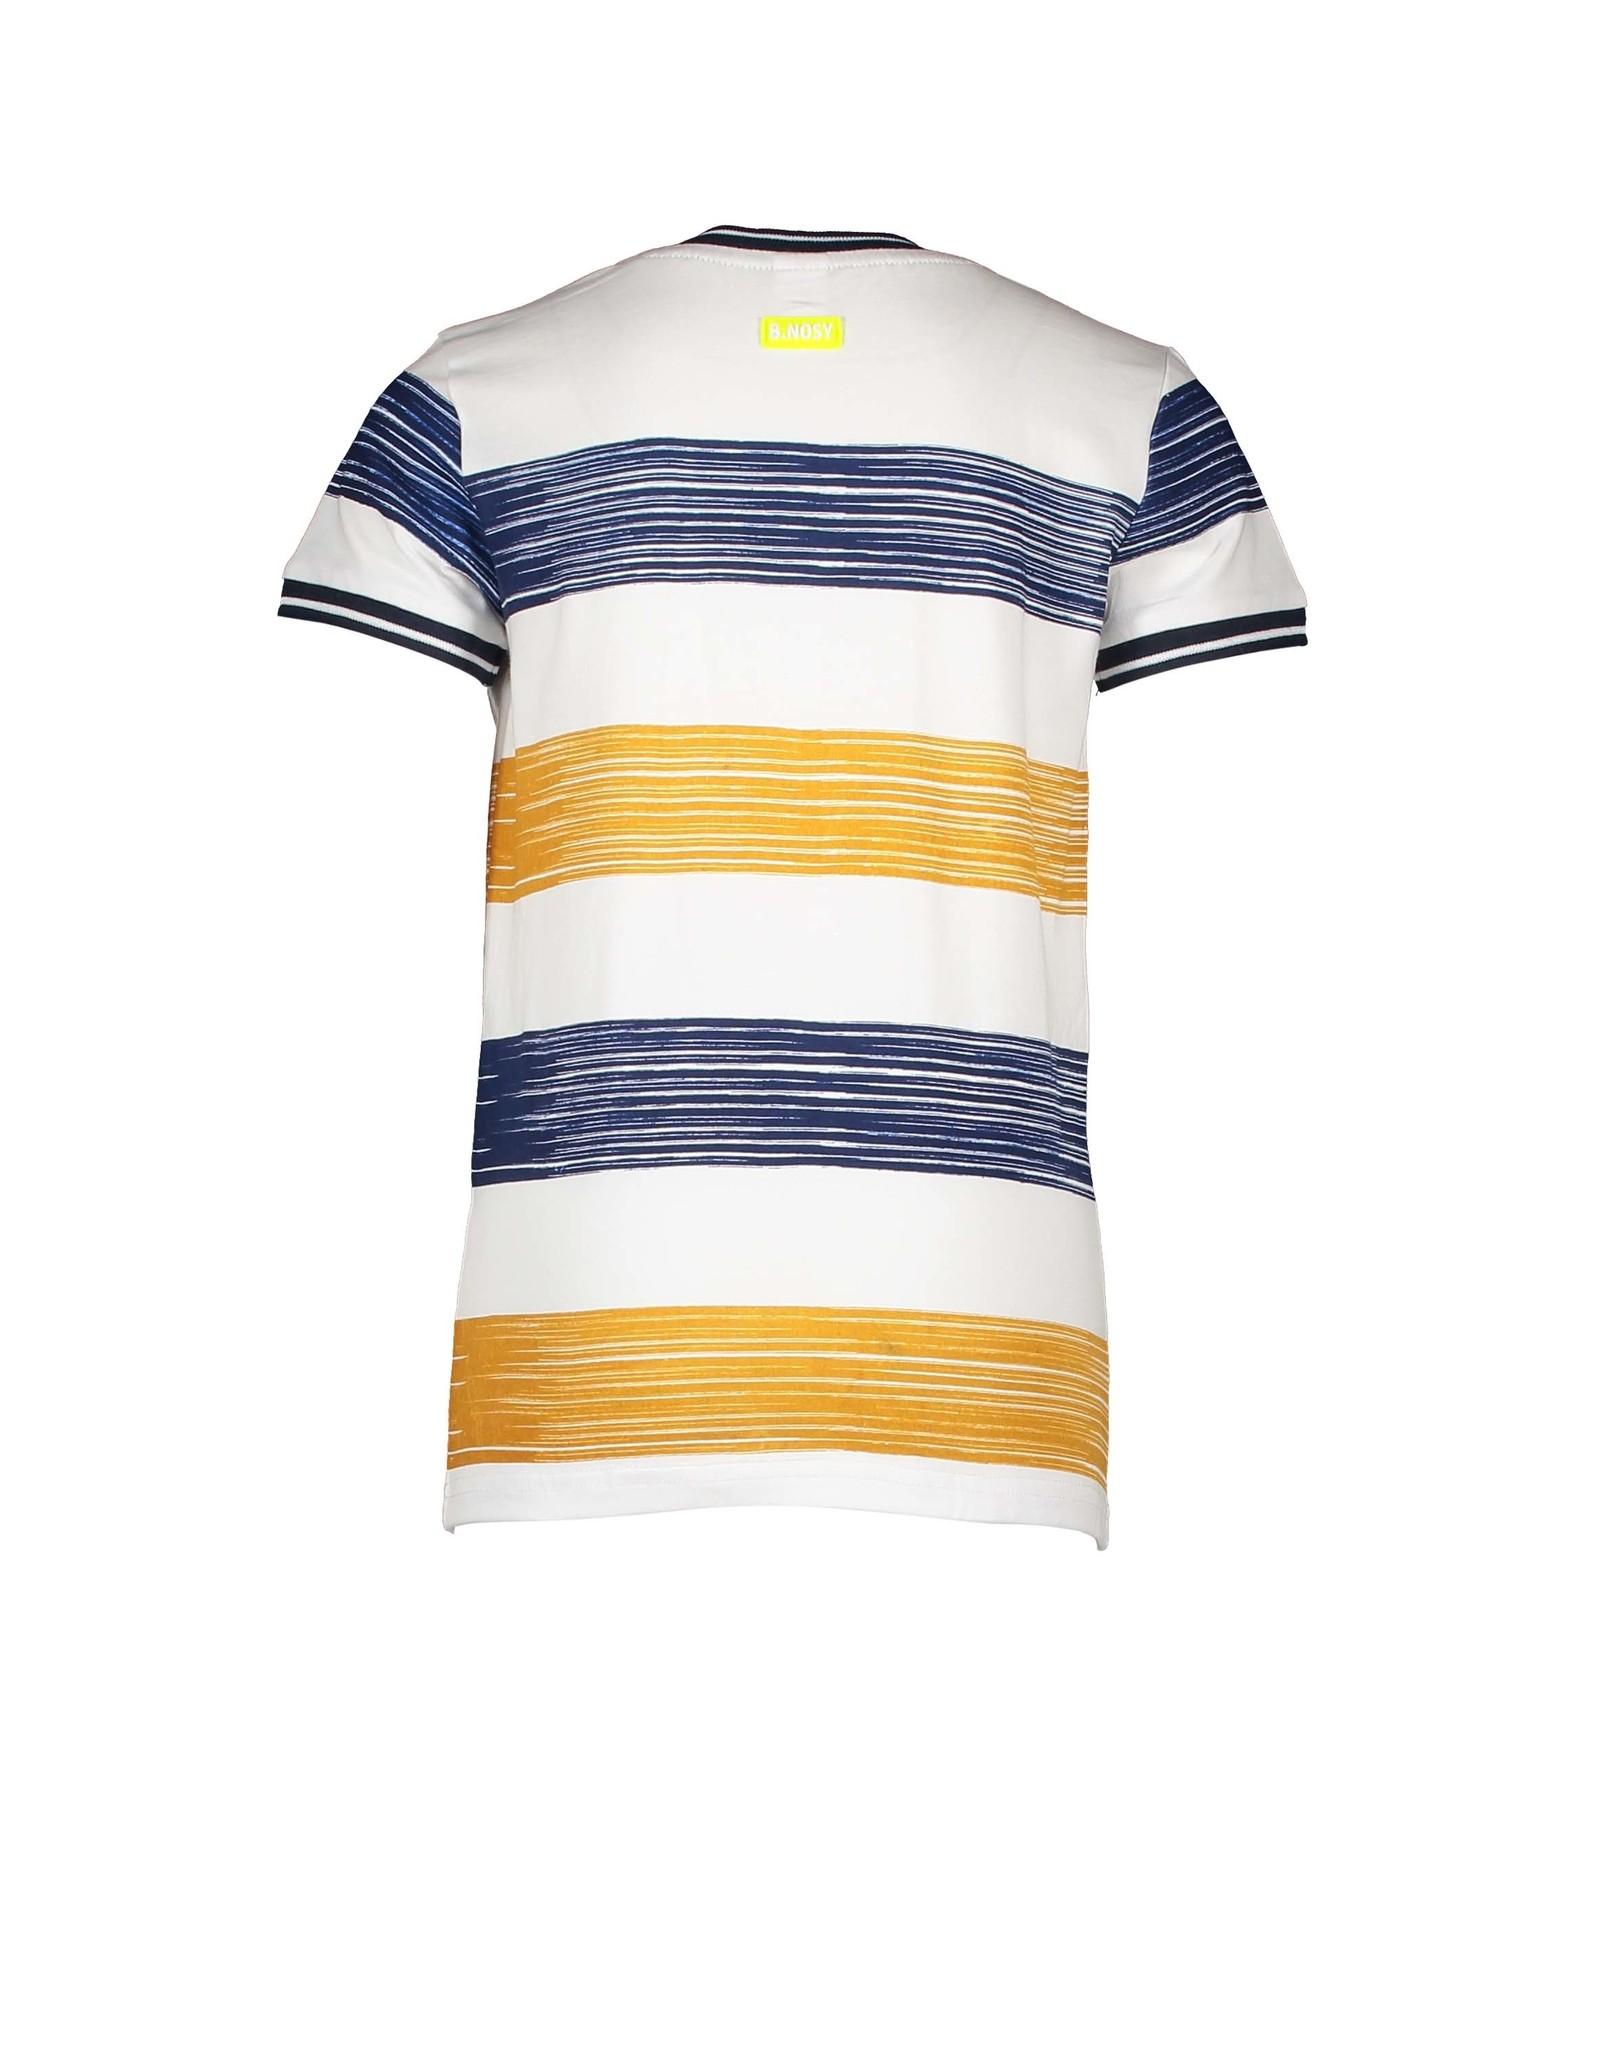 B.Nosy Boys ss shirt with printed stripe